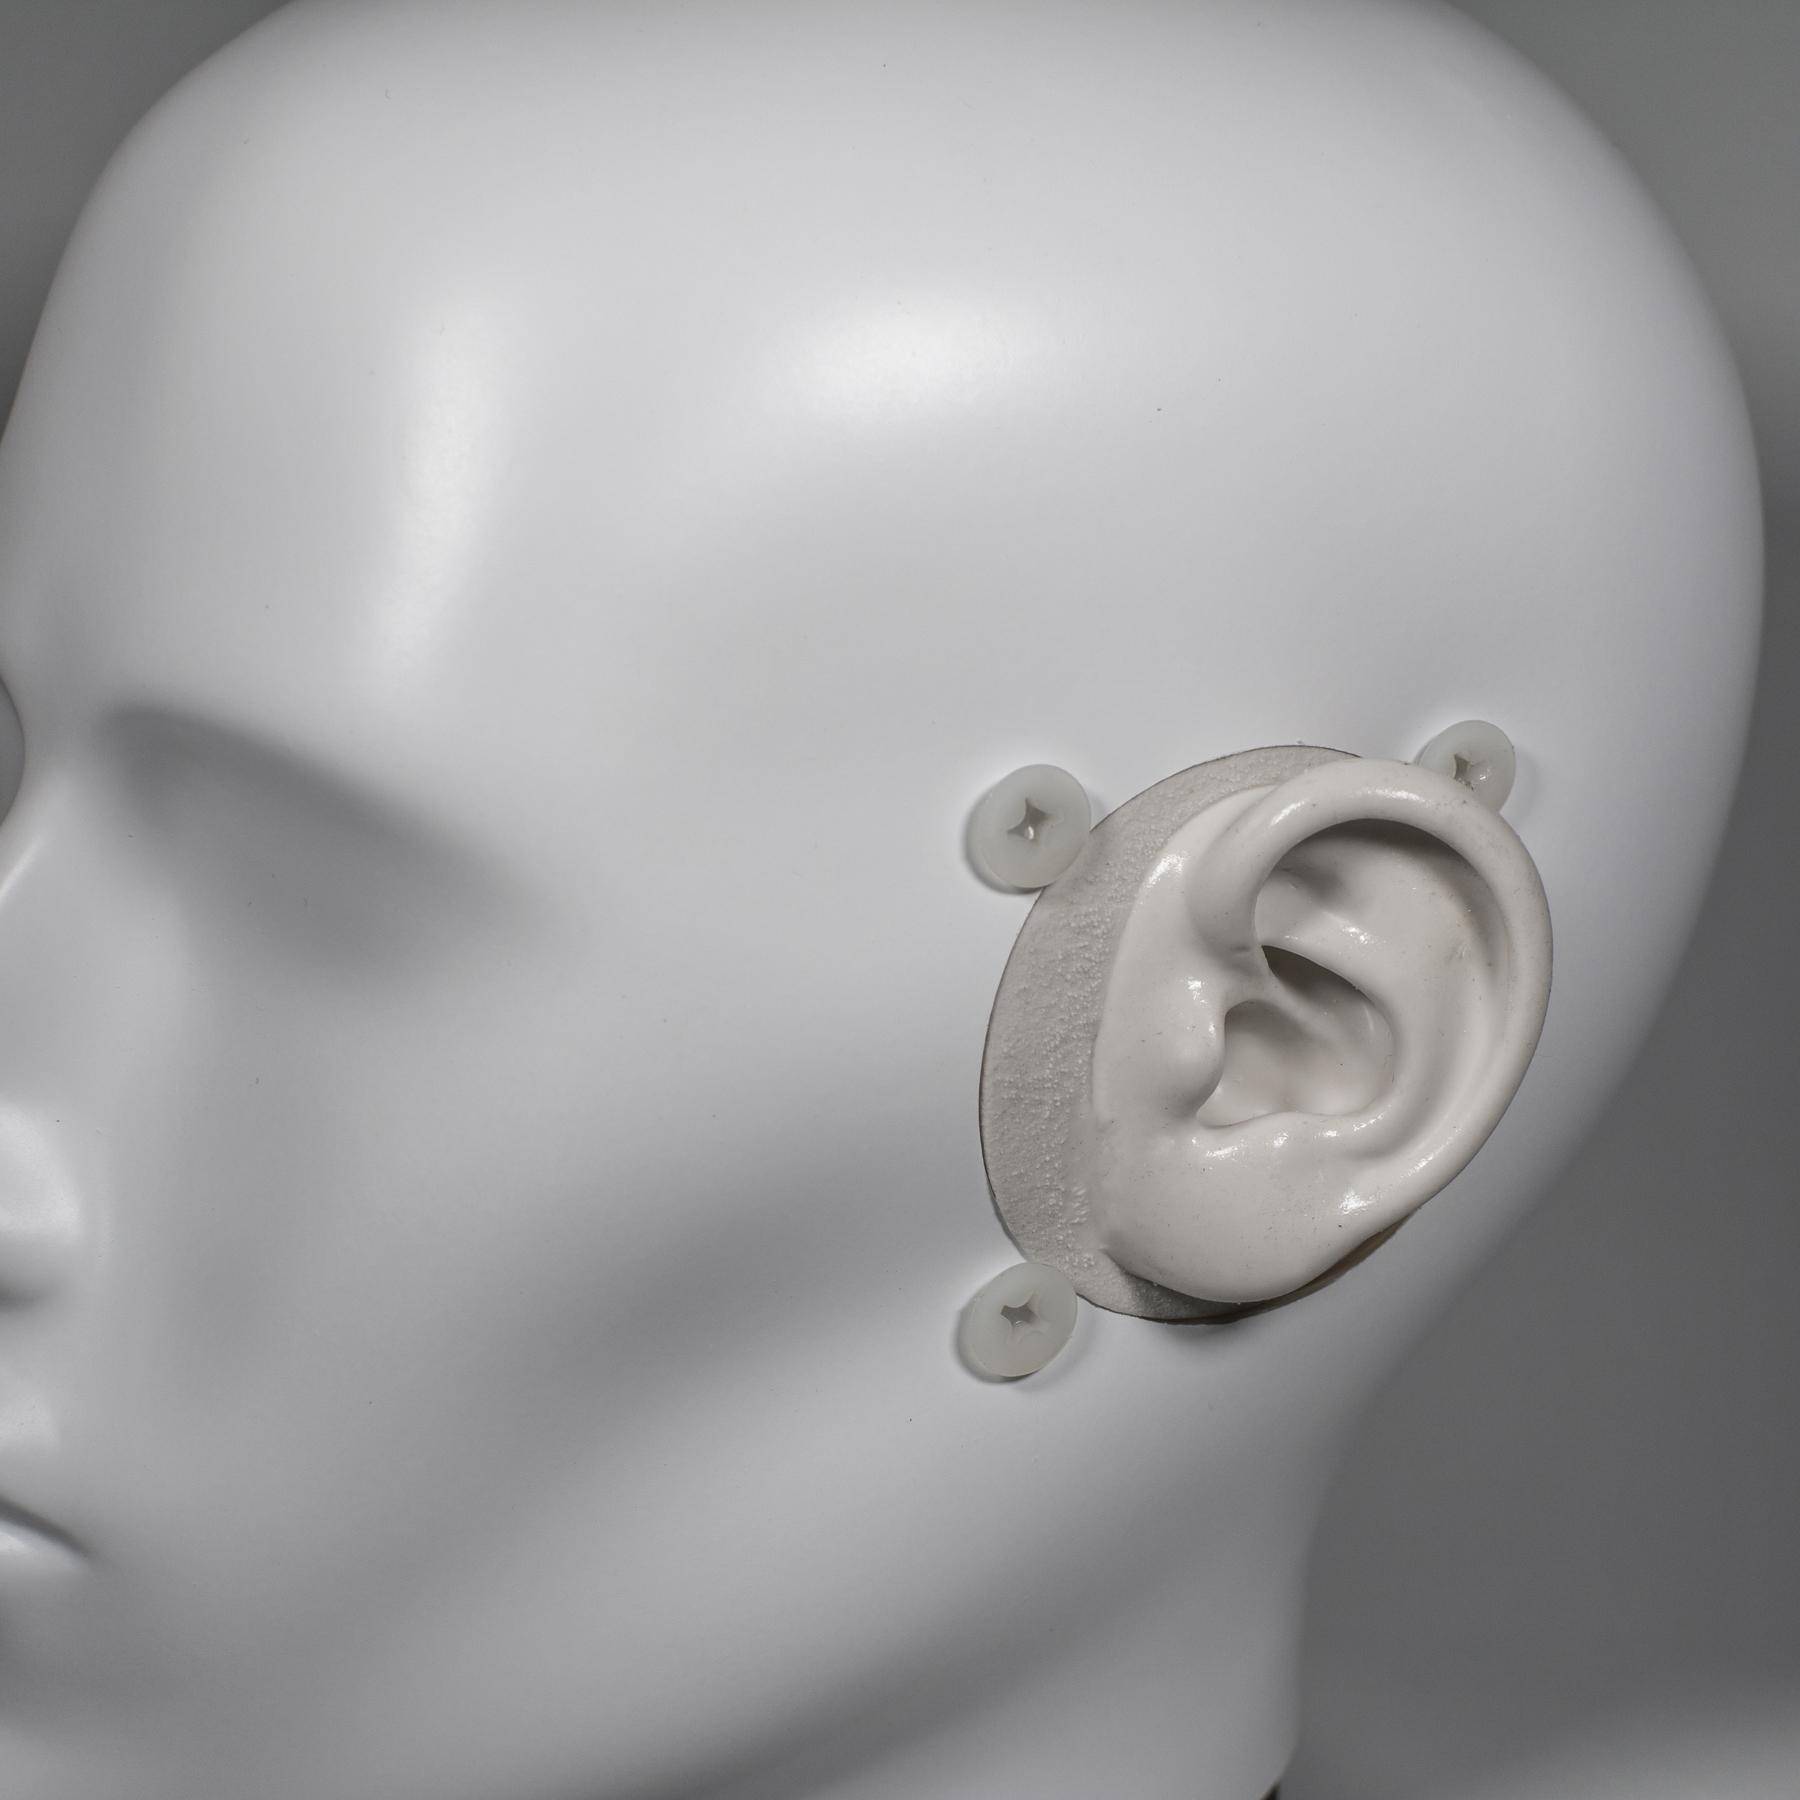 Inspektor gadjet dummy head without electronics inspektor gadjet publicscrutiny Choice Image